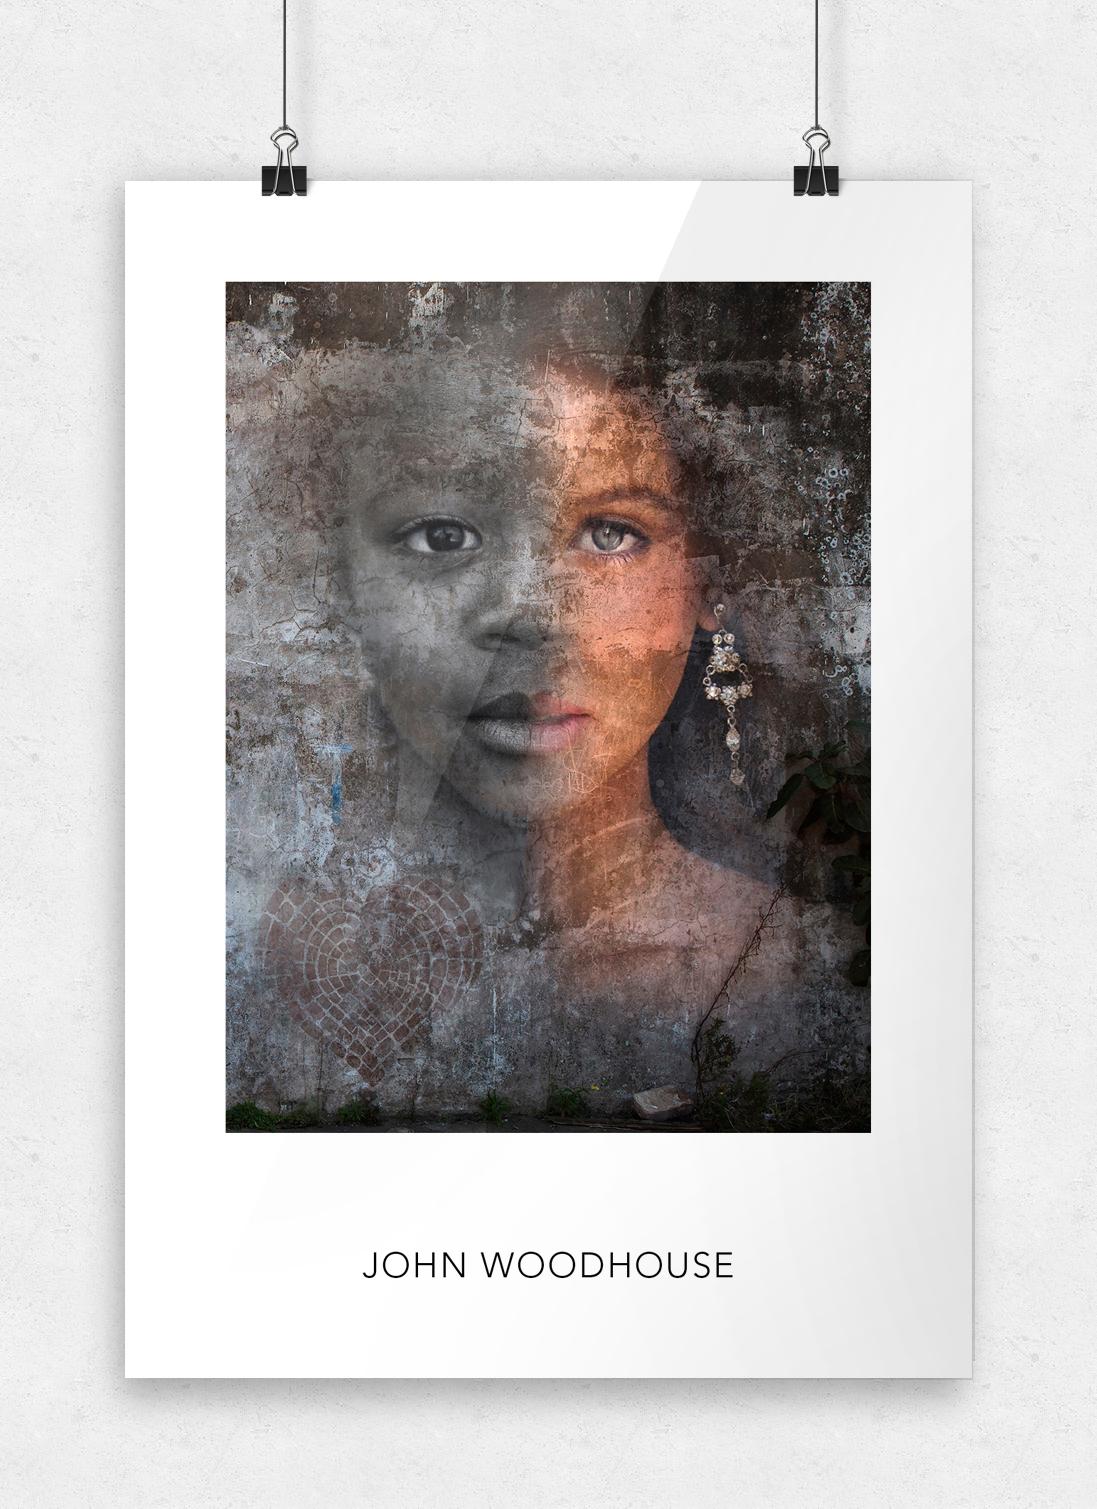 JW-Posters-Template_13.jpg